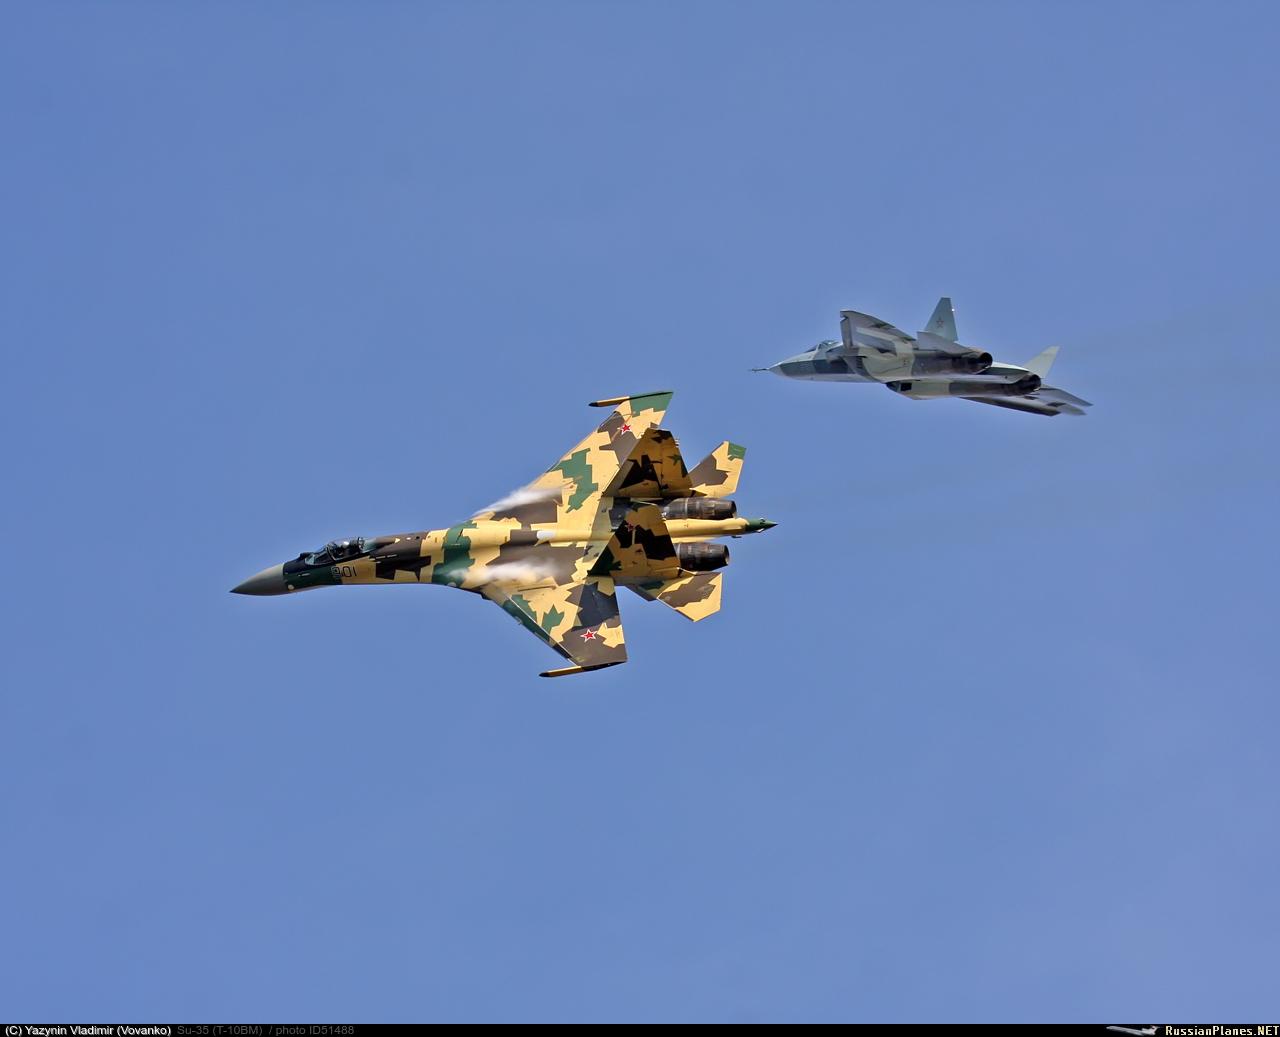 Air Show Moscu Maks 2011 051488